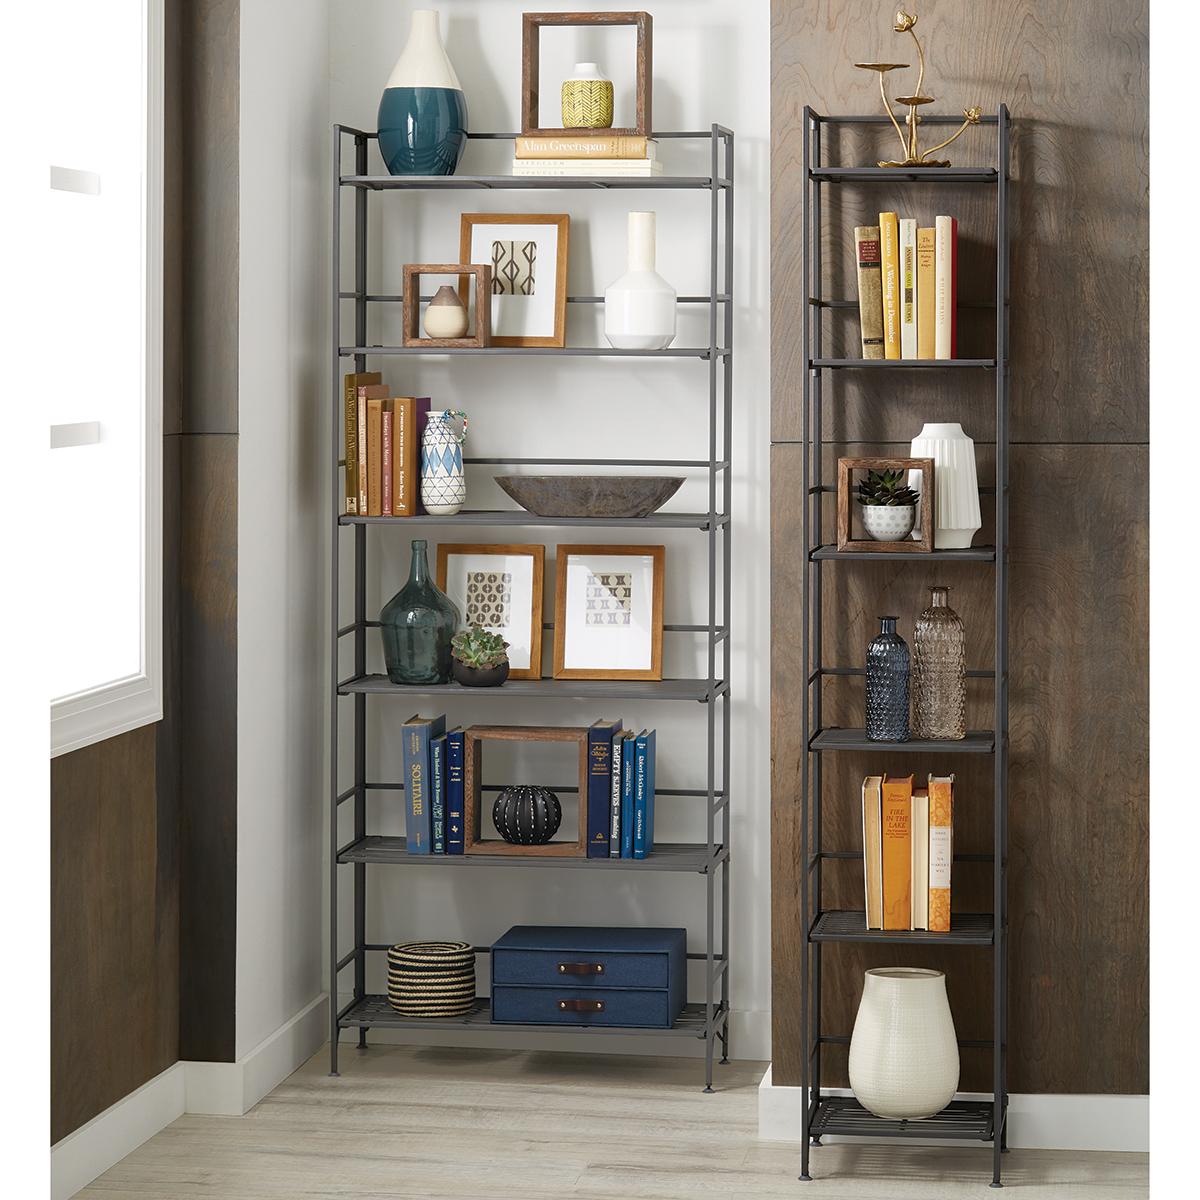 6shelf iron folding bookshelf